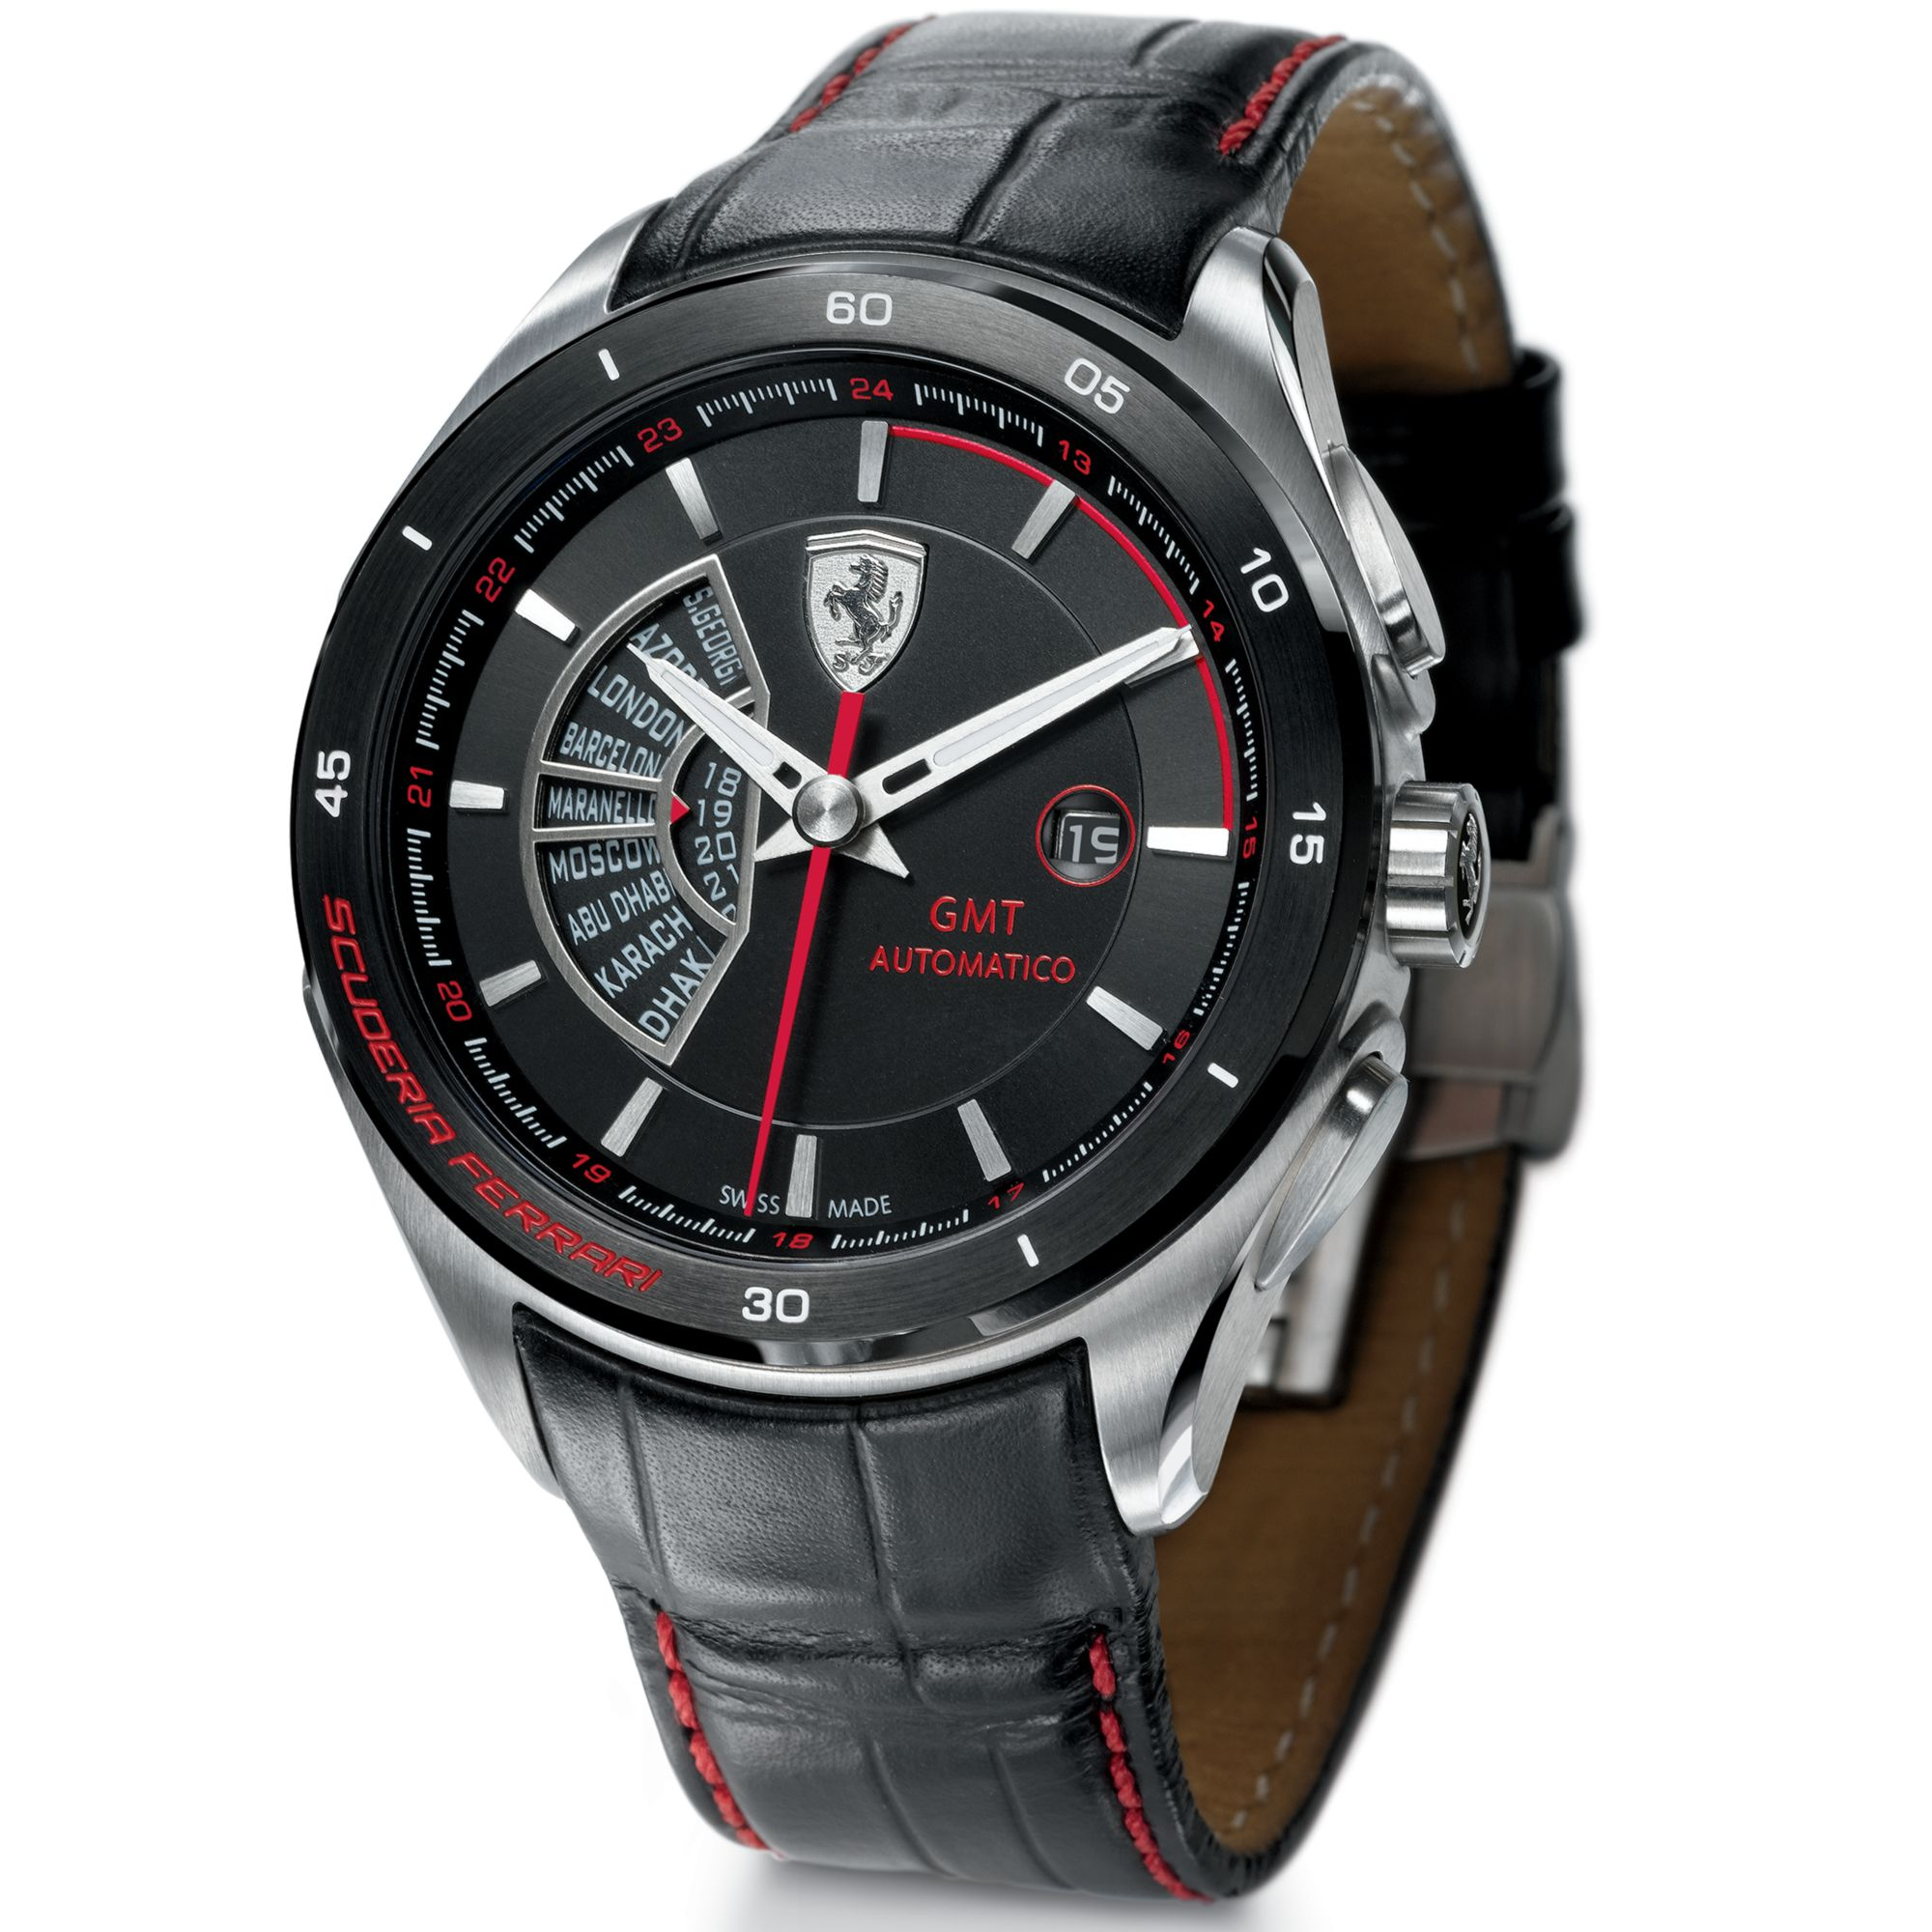 f watches scuderia for sale pitlane teens quartz ferrari online watch au en store official man